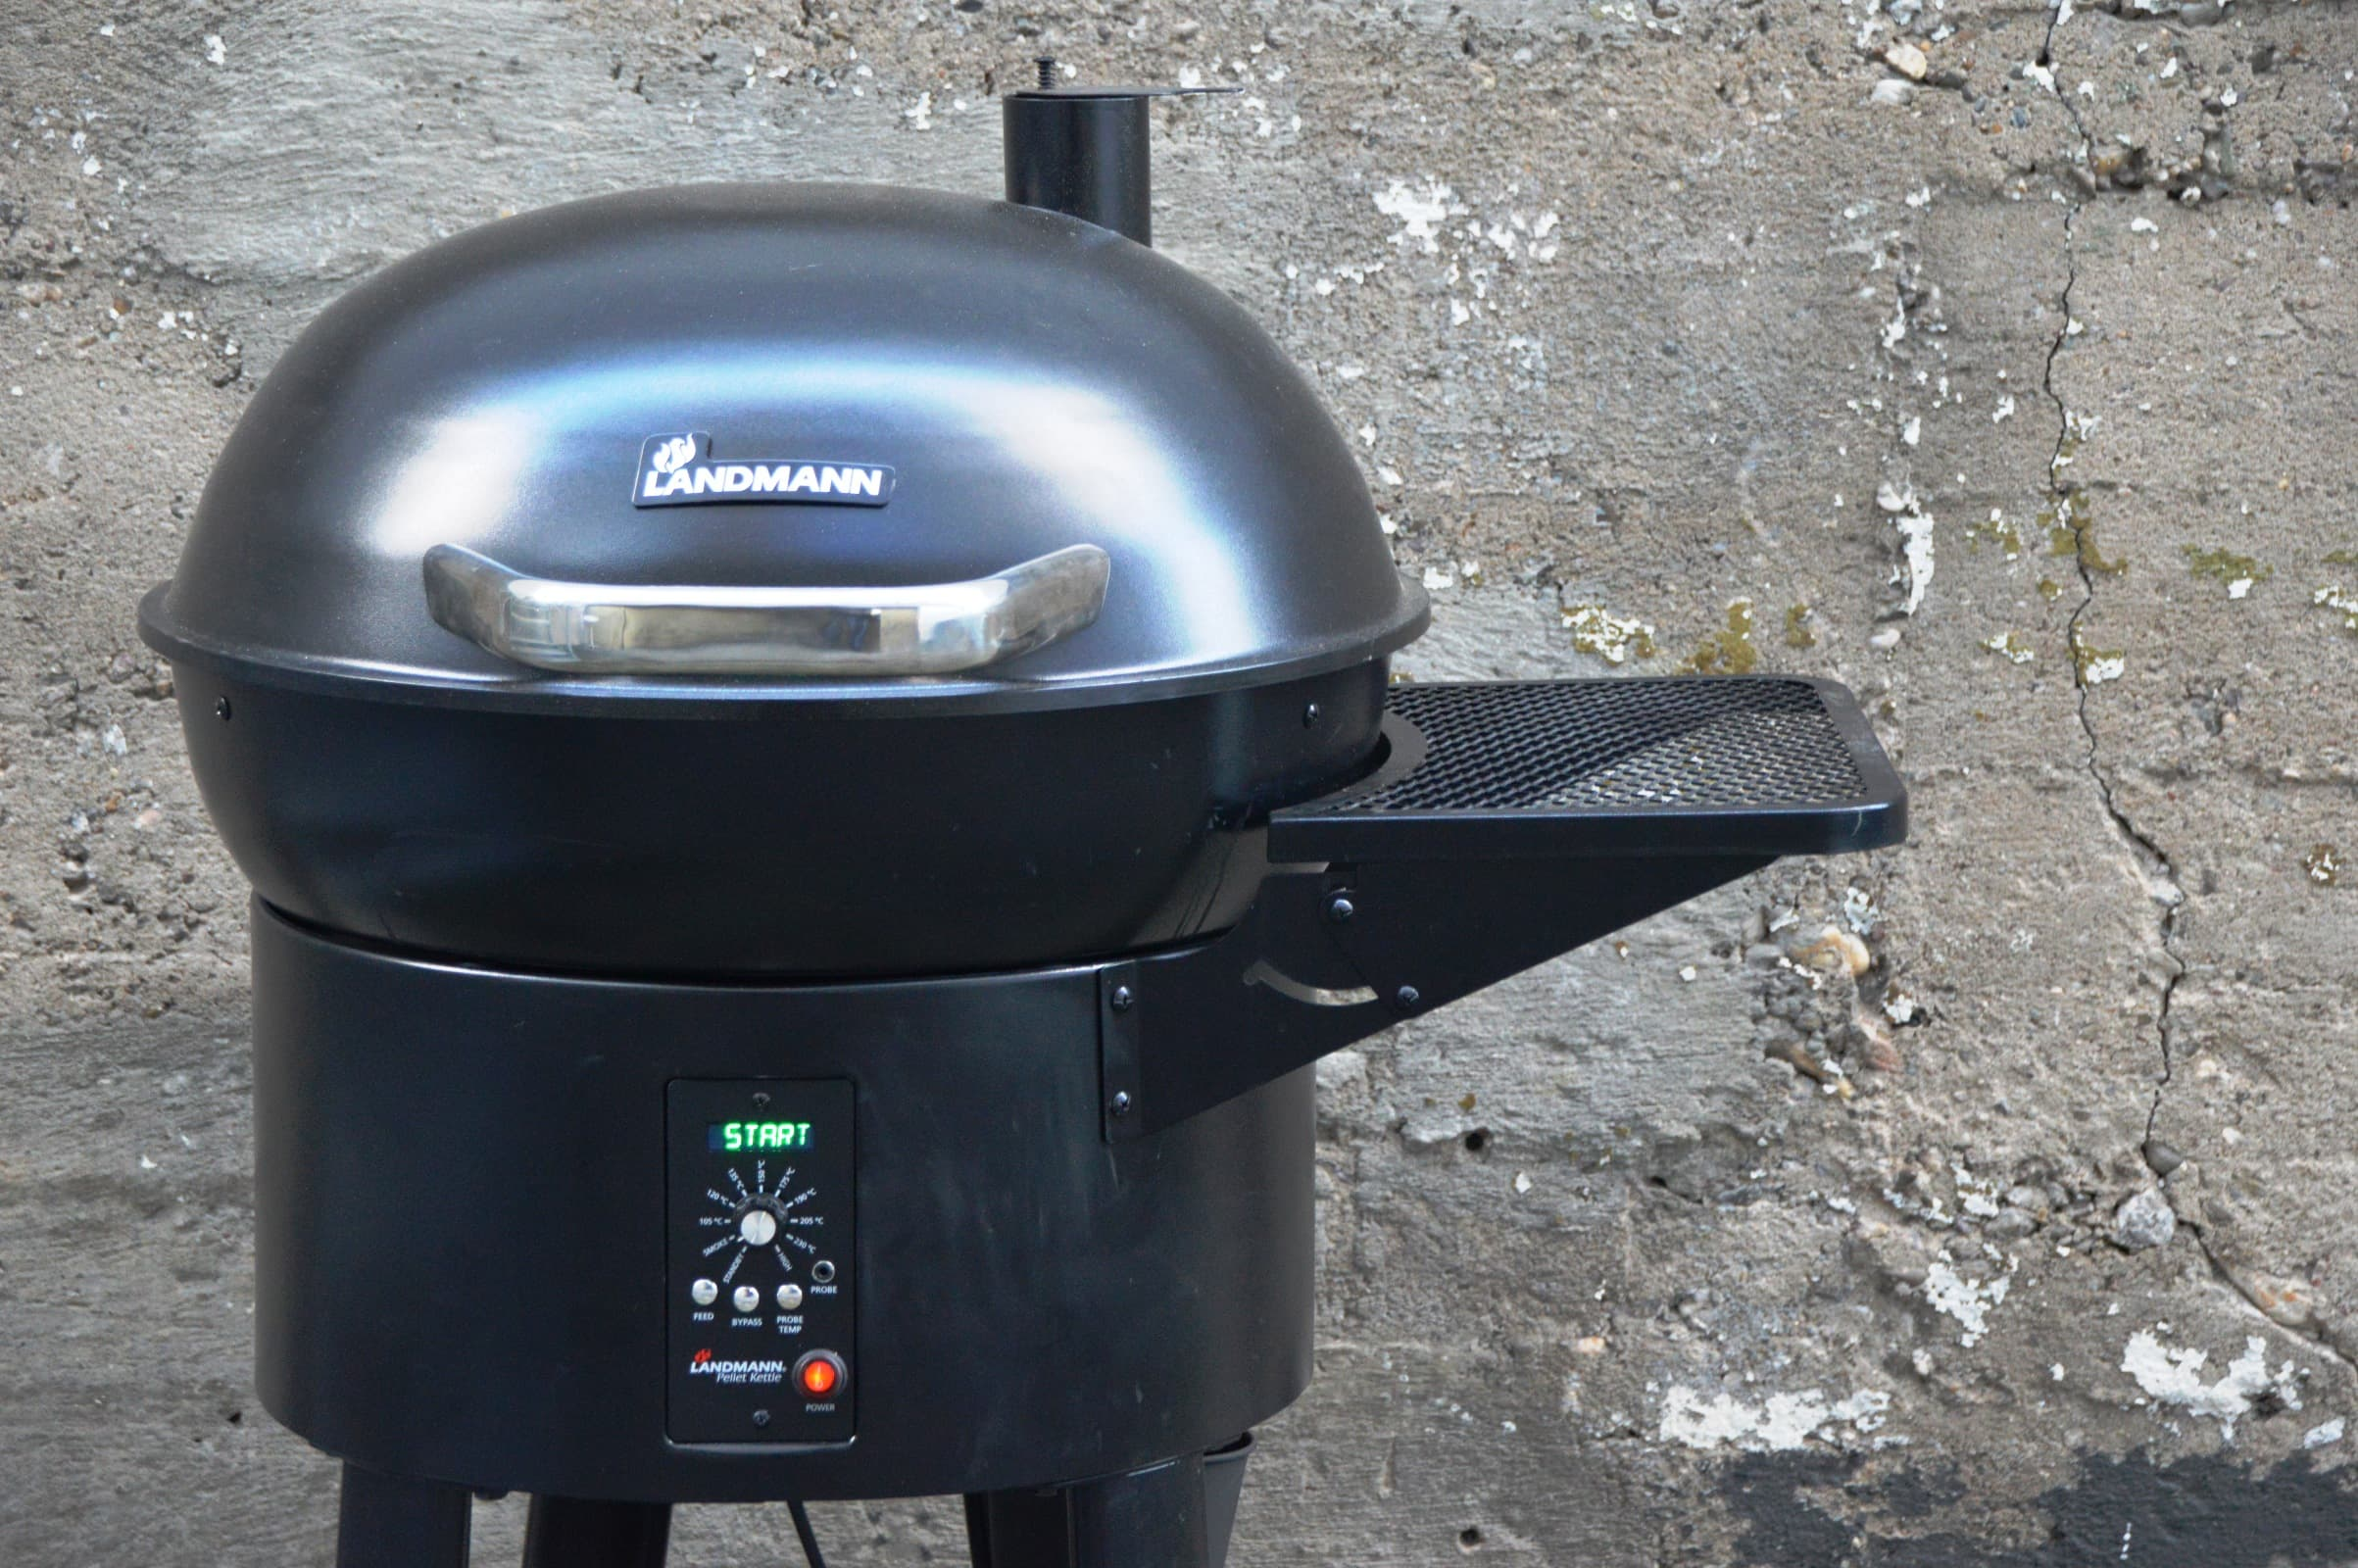 Landmann Gasgrill Köln : Angegrillt landmann pellet kettle im test bacon zum steak